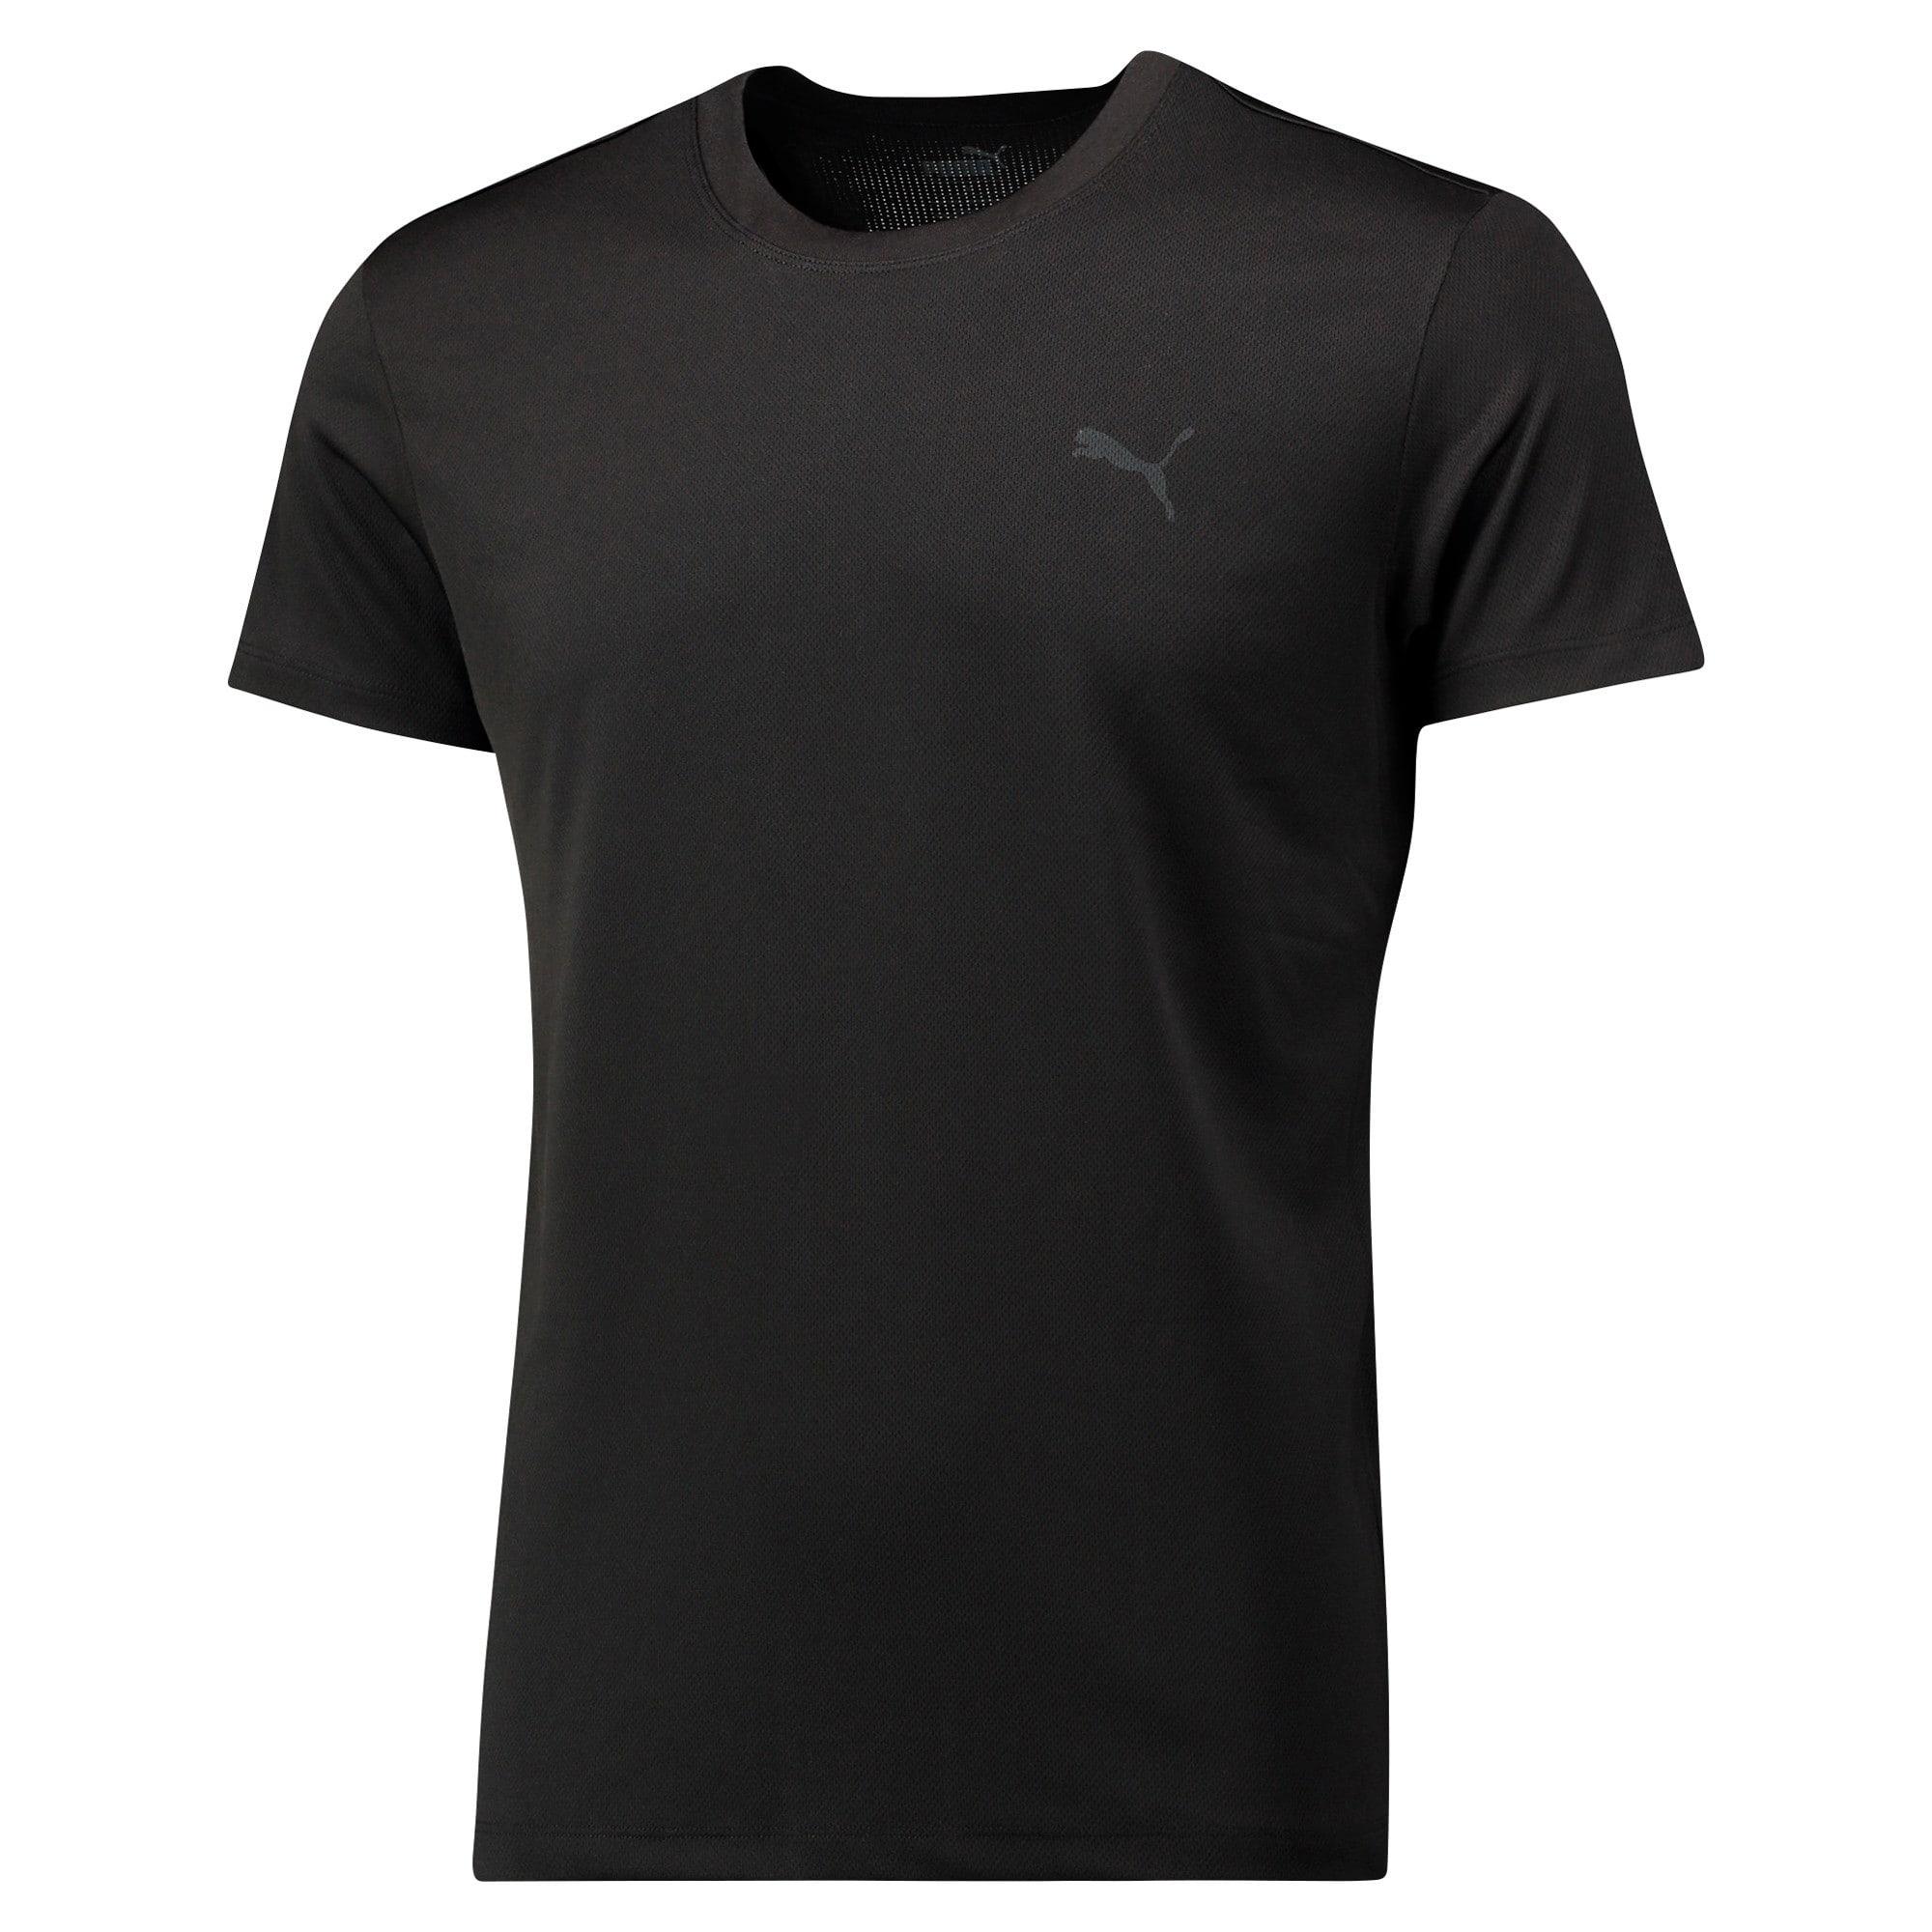 Thumbnail 1 of Active Men's Cree T-Shirt, black, medium